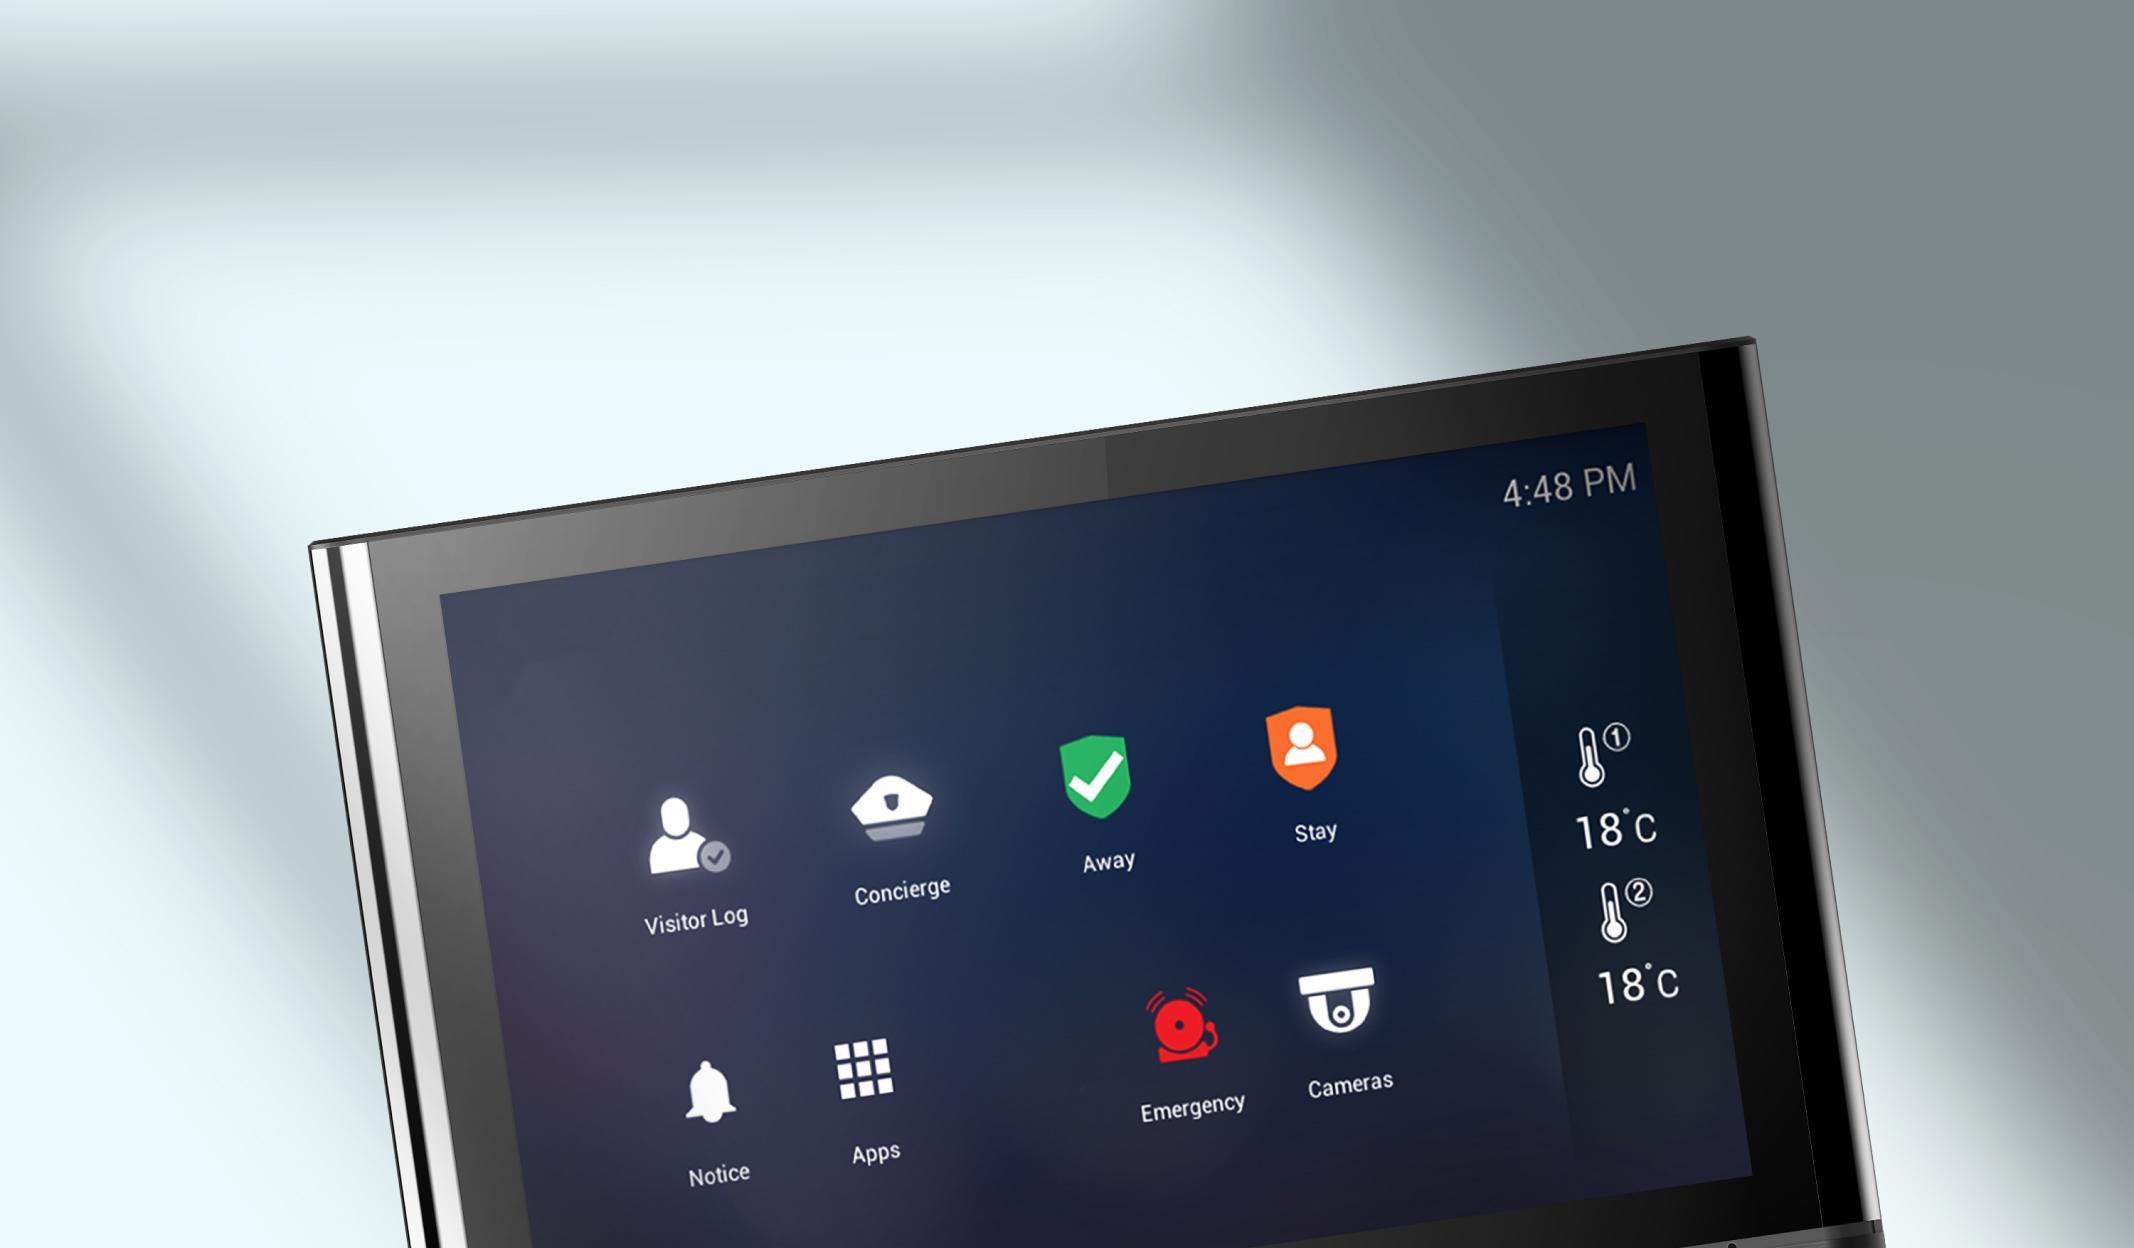 SmartONE wall pad